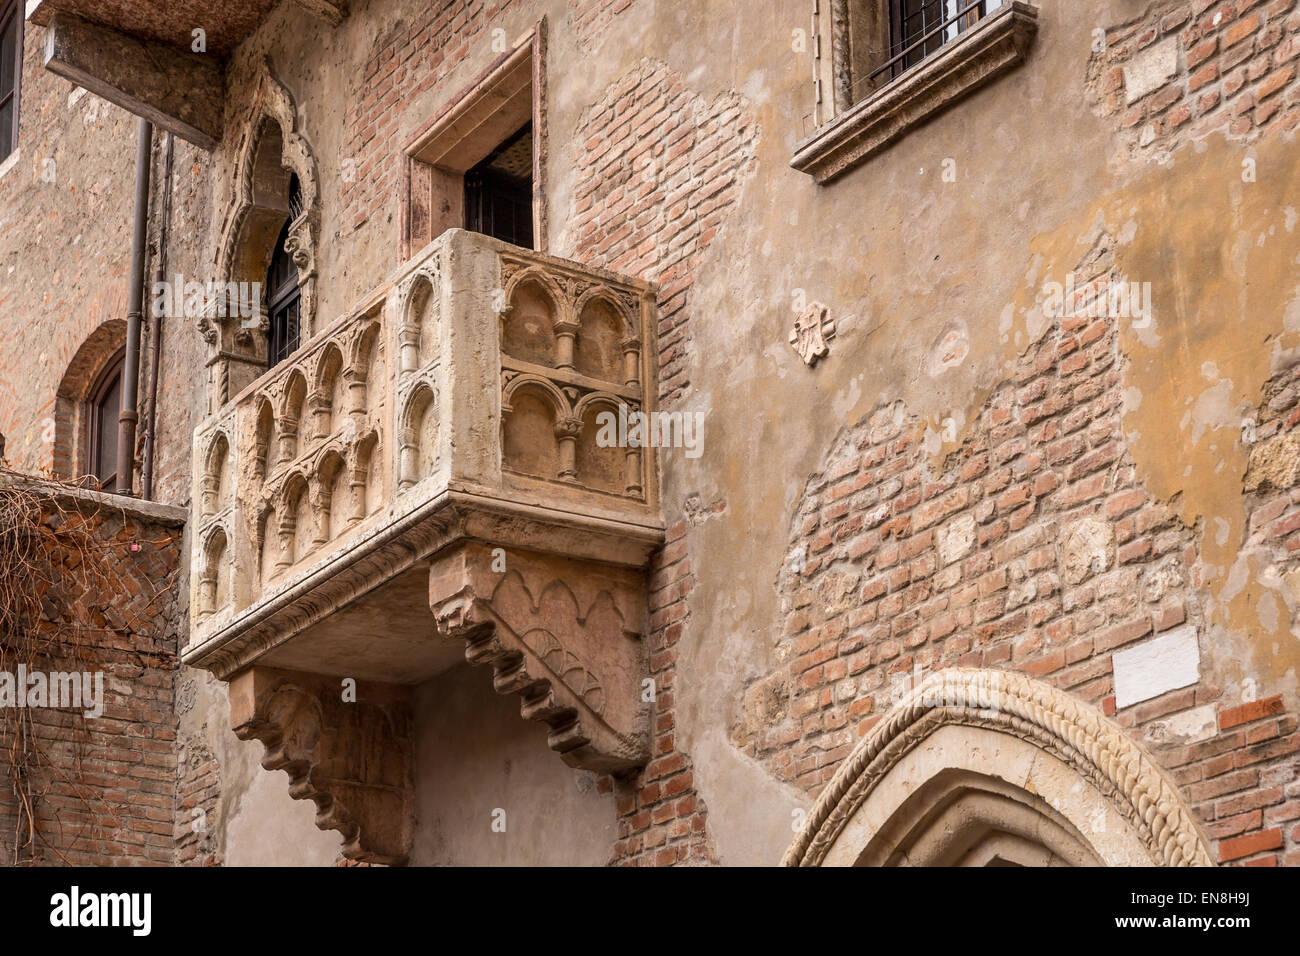 Le balcon de Juliette, Vérone, UNESCO World Heritage Site, Veneto, Italie Photo Stock